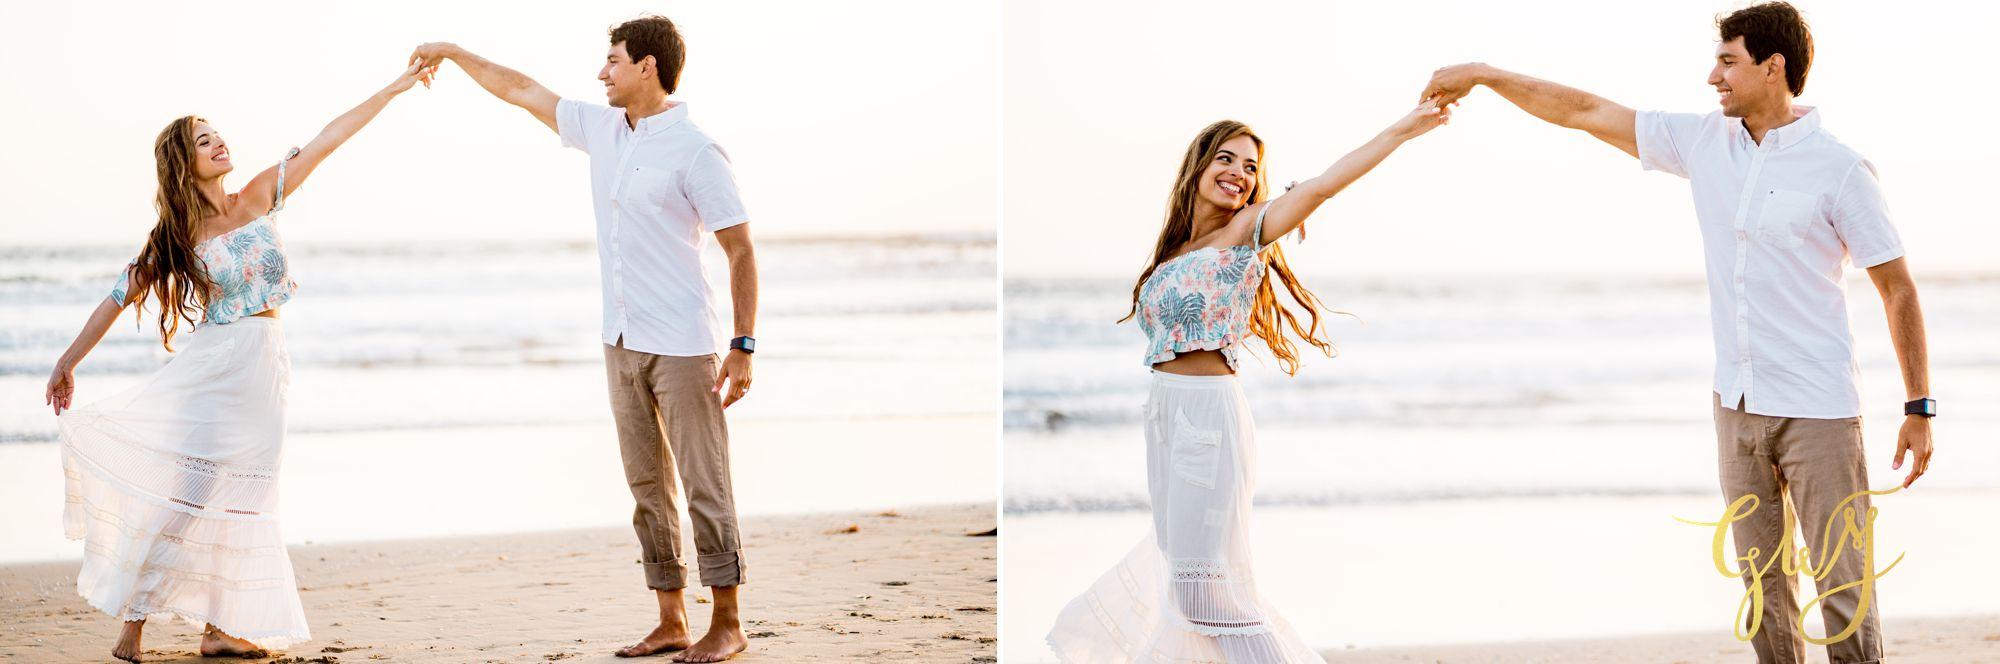 Felipe + Isabella Huntington Beach Summer Sunset Engagement Session by Glass Woods Media 27.jpg